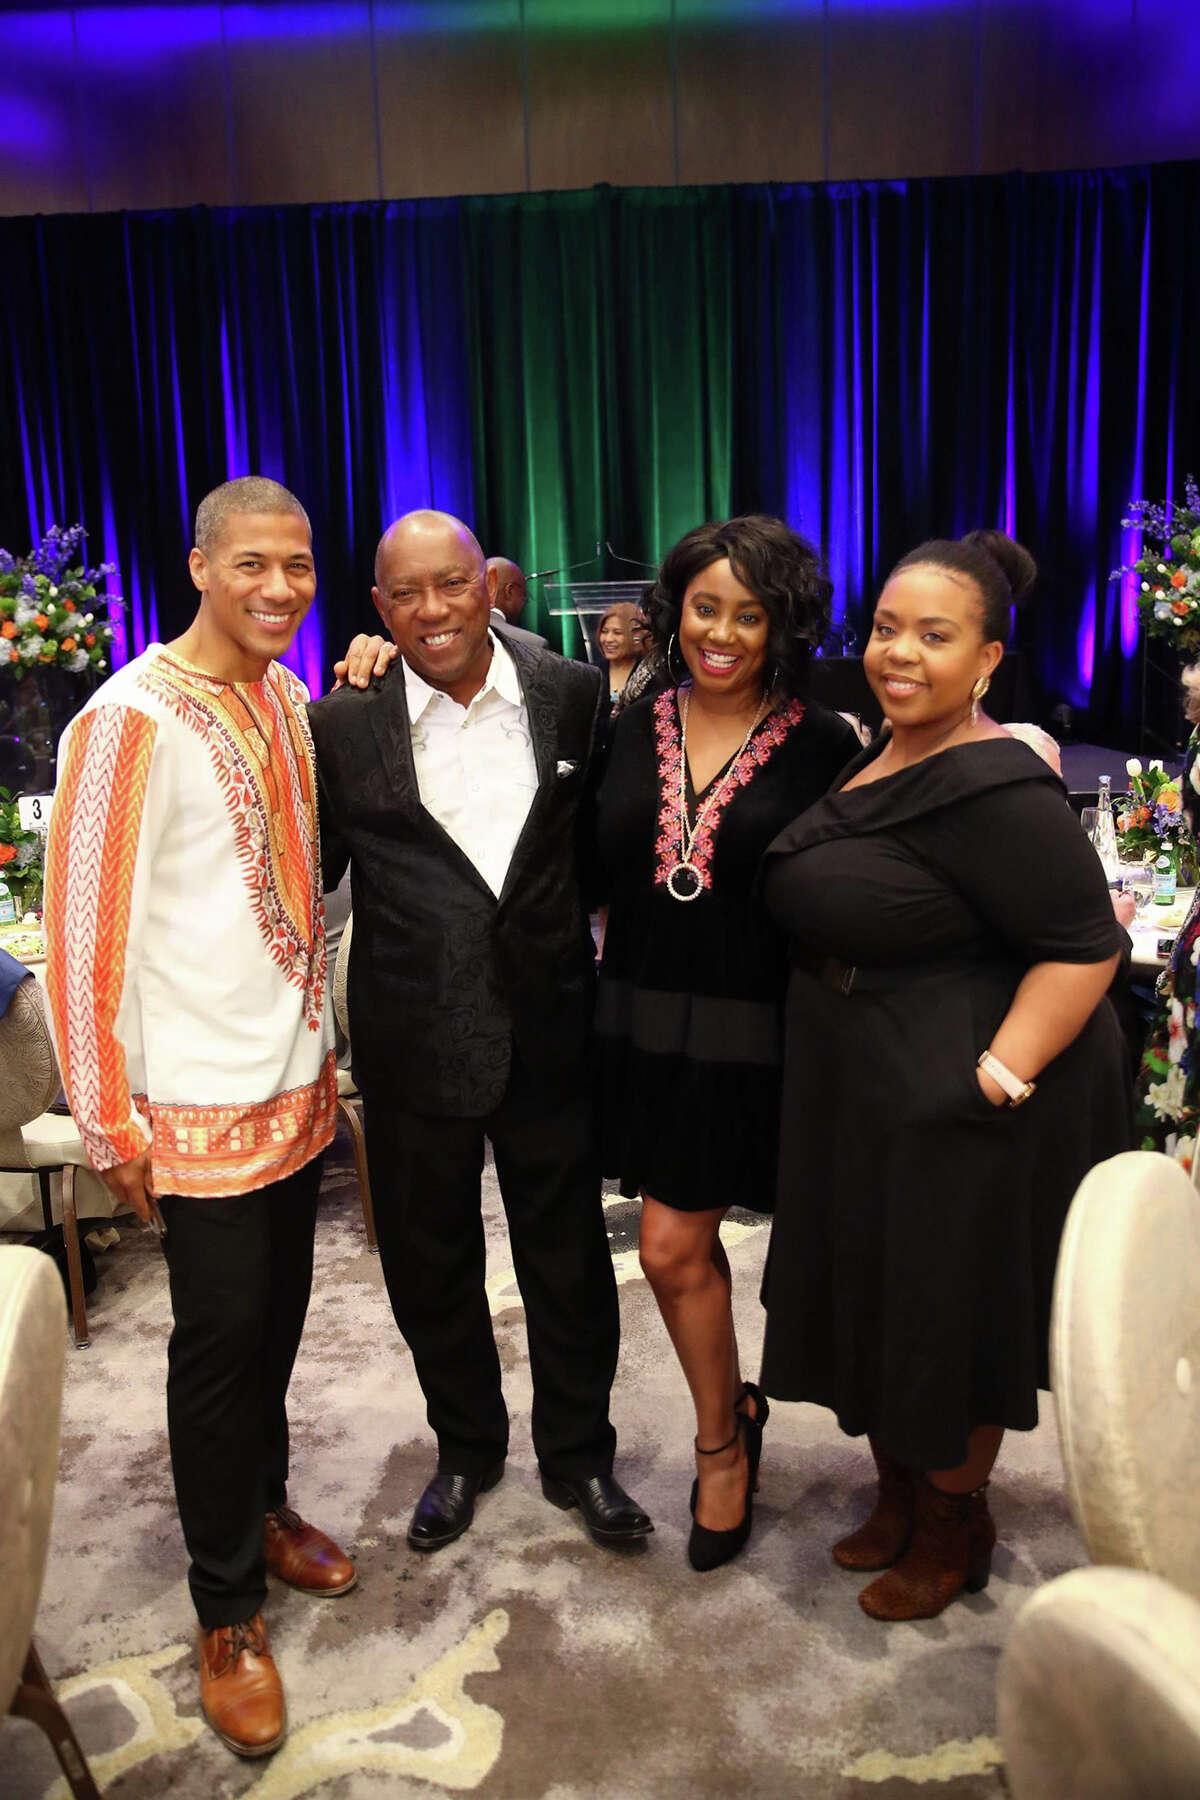 Shannon Lanier, Mayor Sylvester Turner, Misha McClure and Ashley Turner